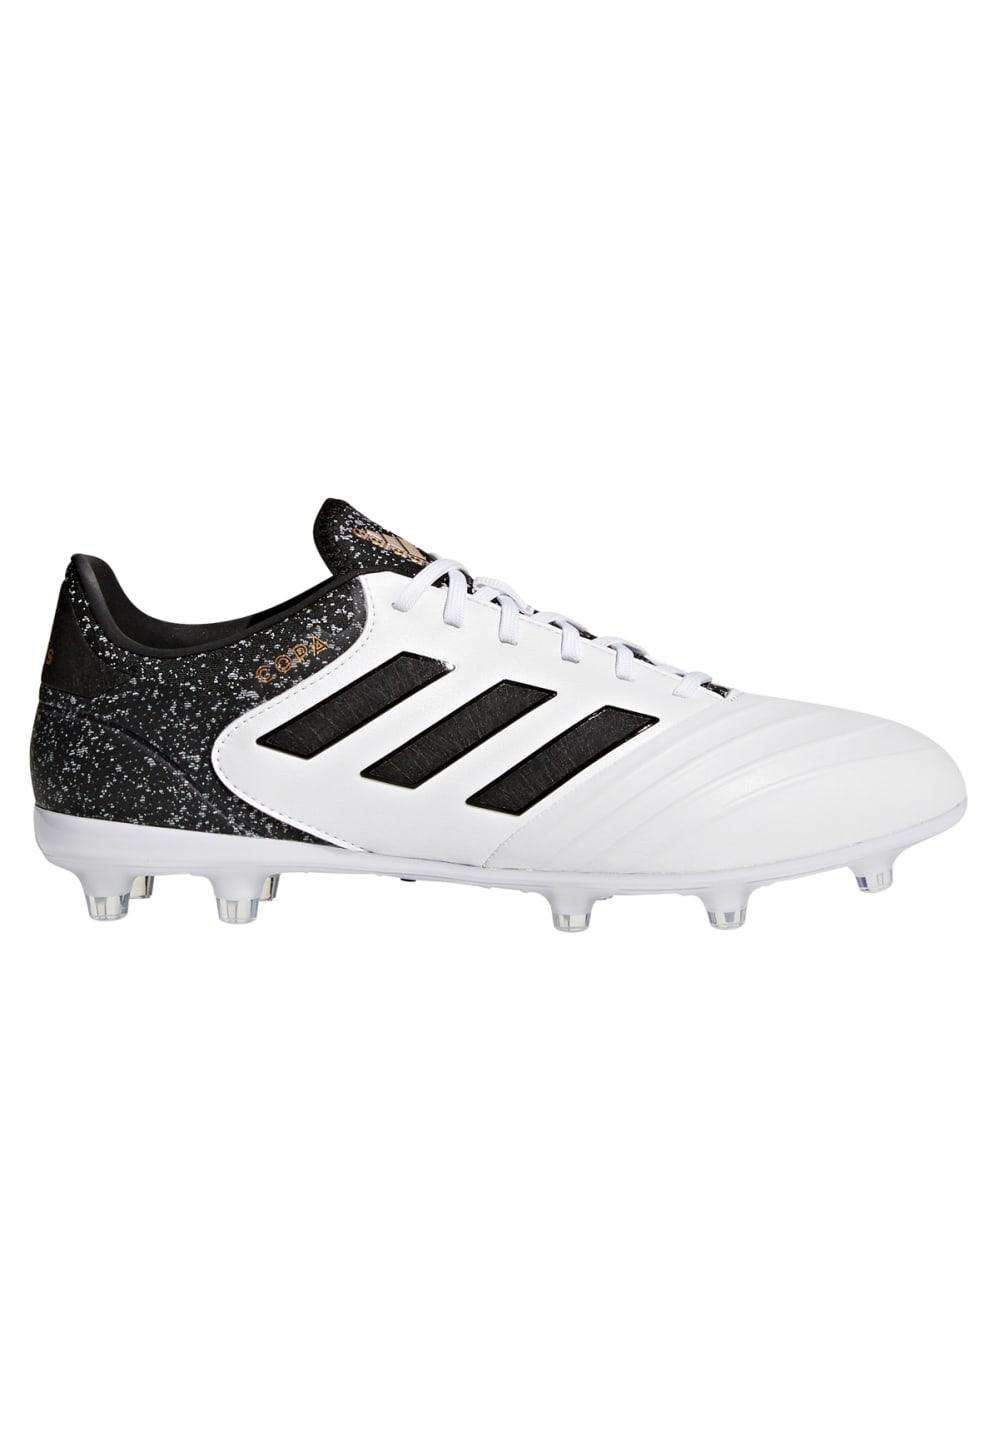 adidas Copa 18.2 Fg - Football Shoes for Men - Multicolor